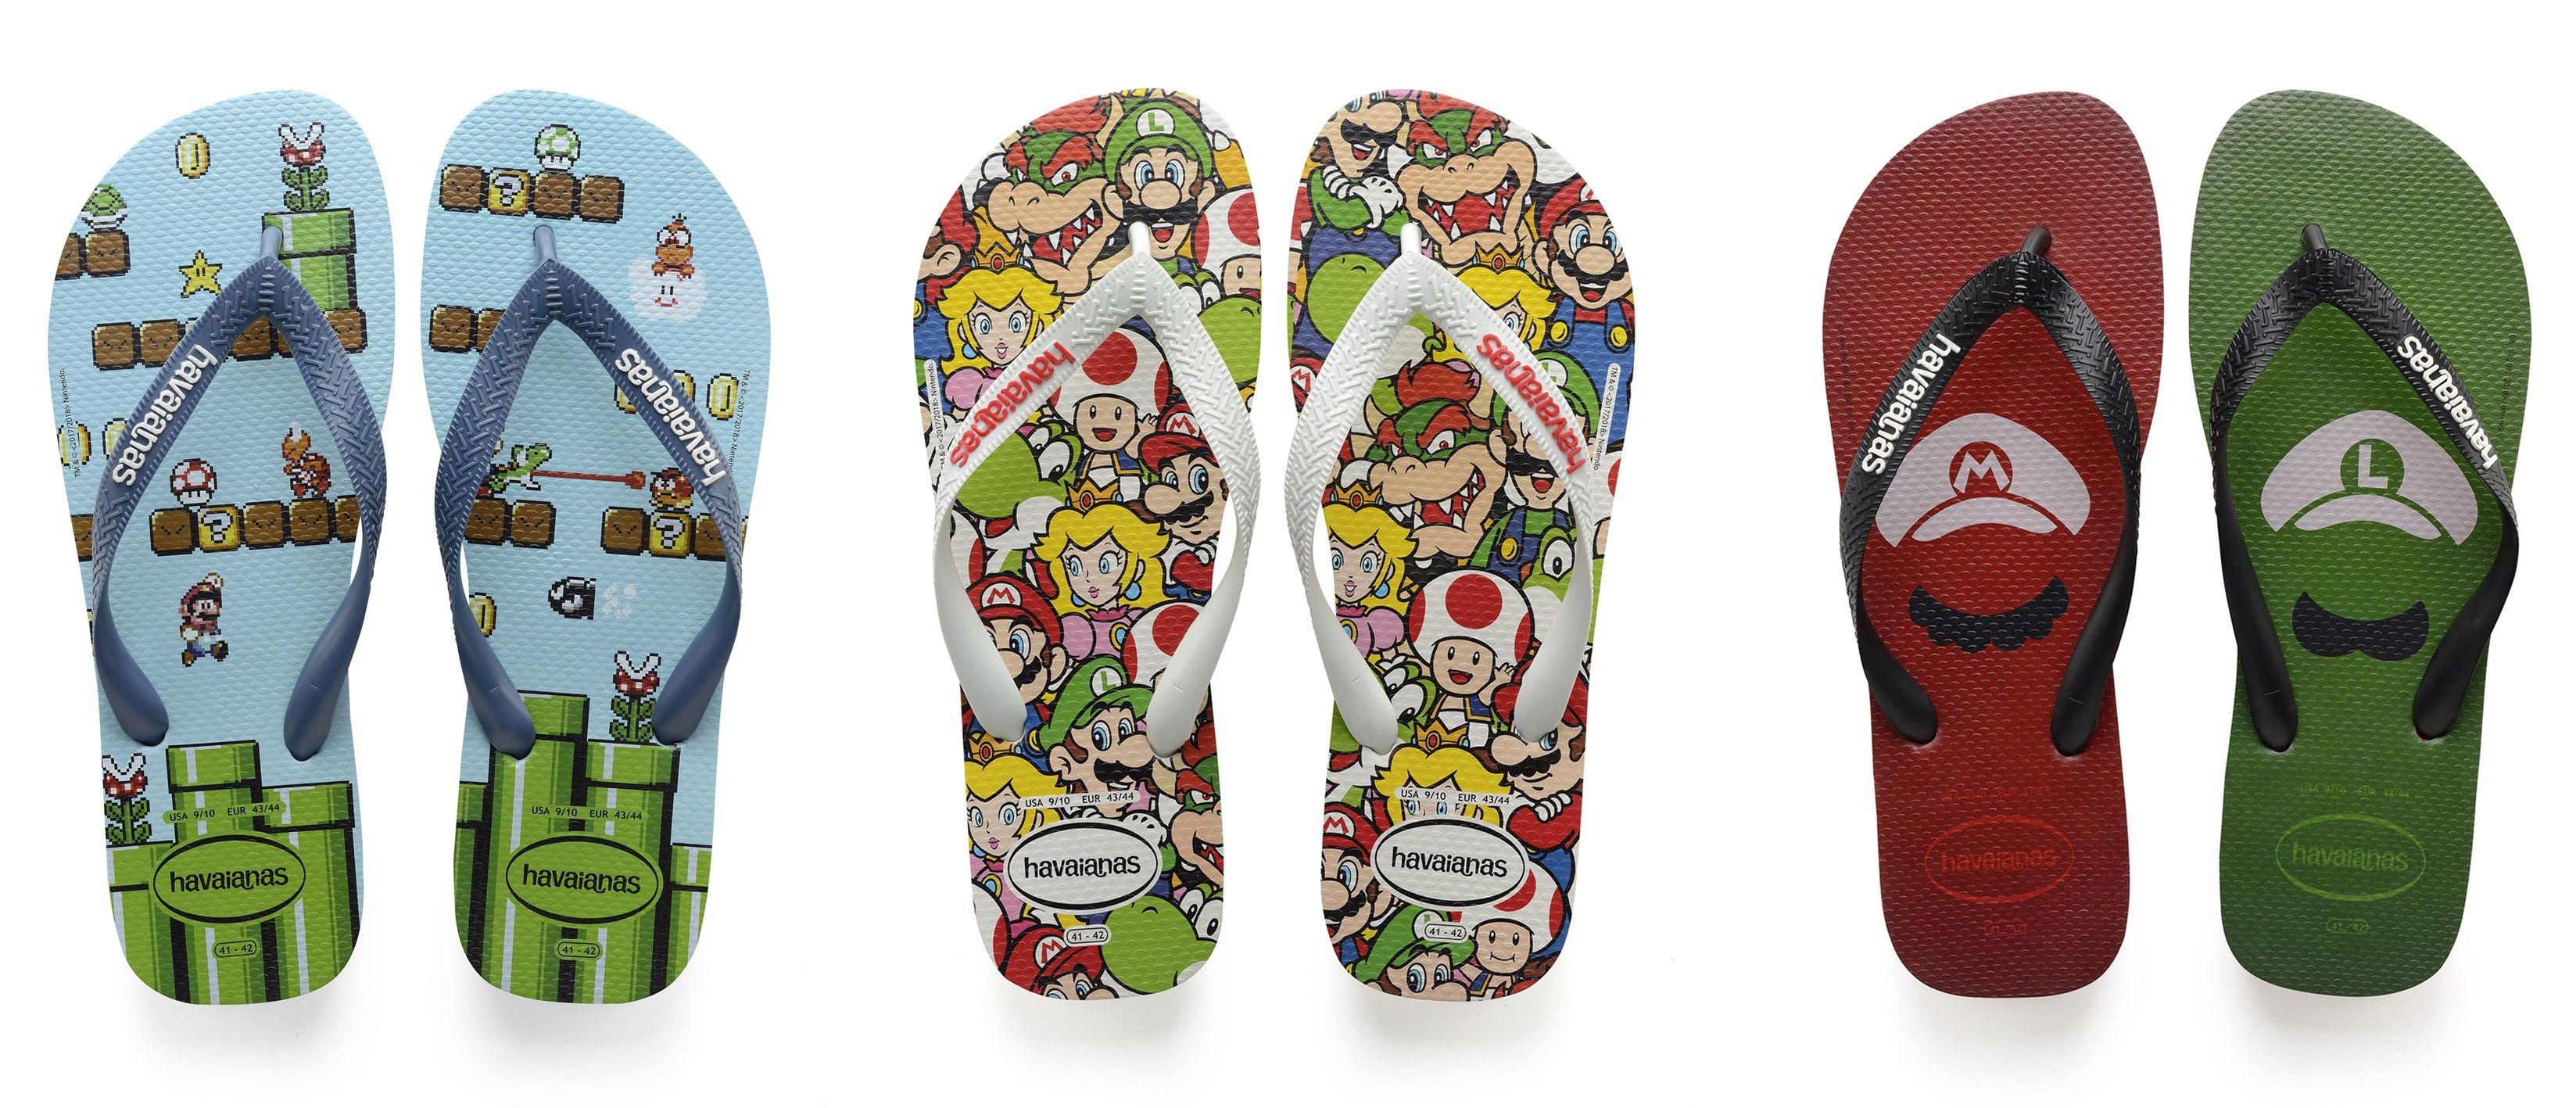 Super Cute! Havaianas Merilis Koleksi Sandal Bertema Kartun